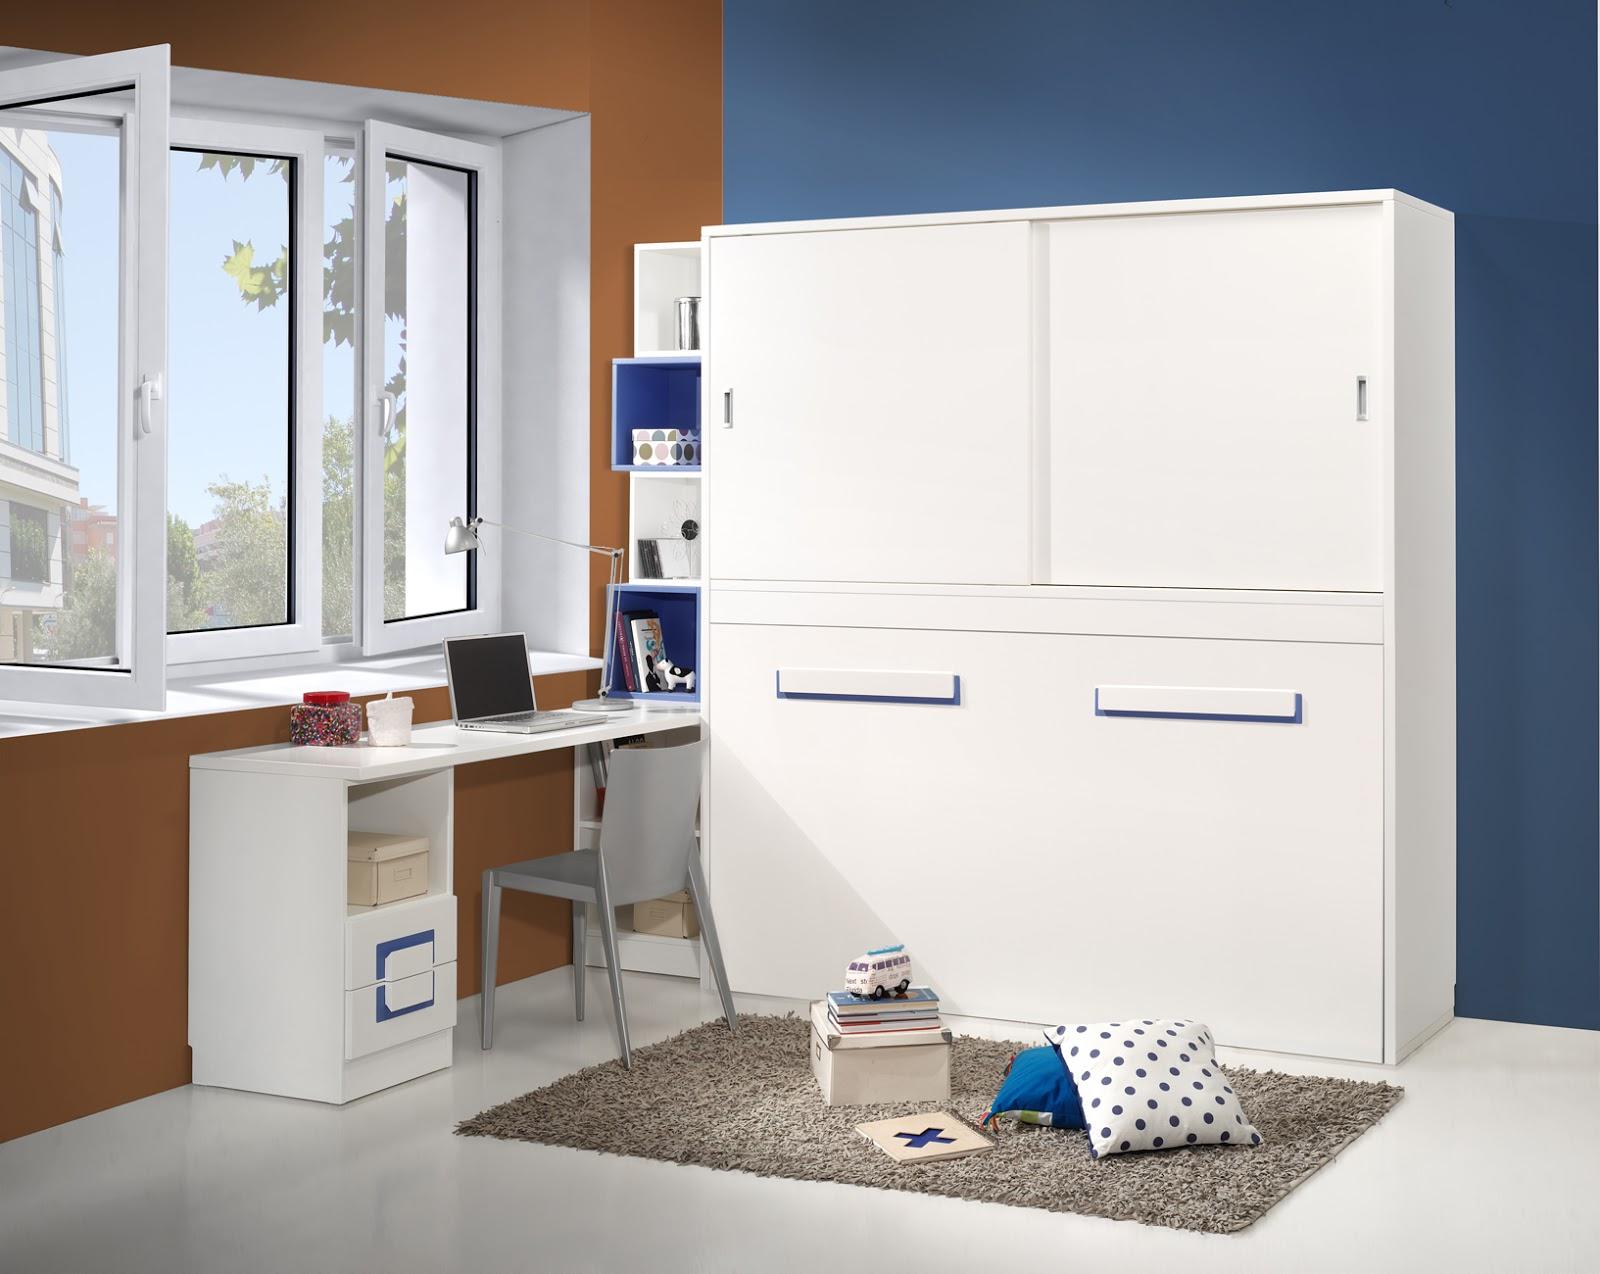 Dormitorios juveniles madrid top dormitorios juveniles for Mueble cama plegable conforama